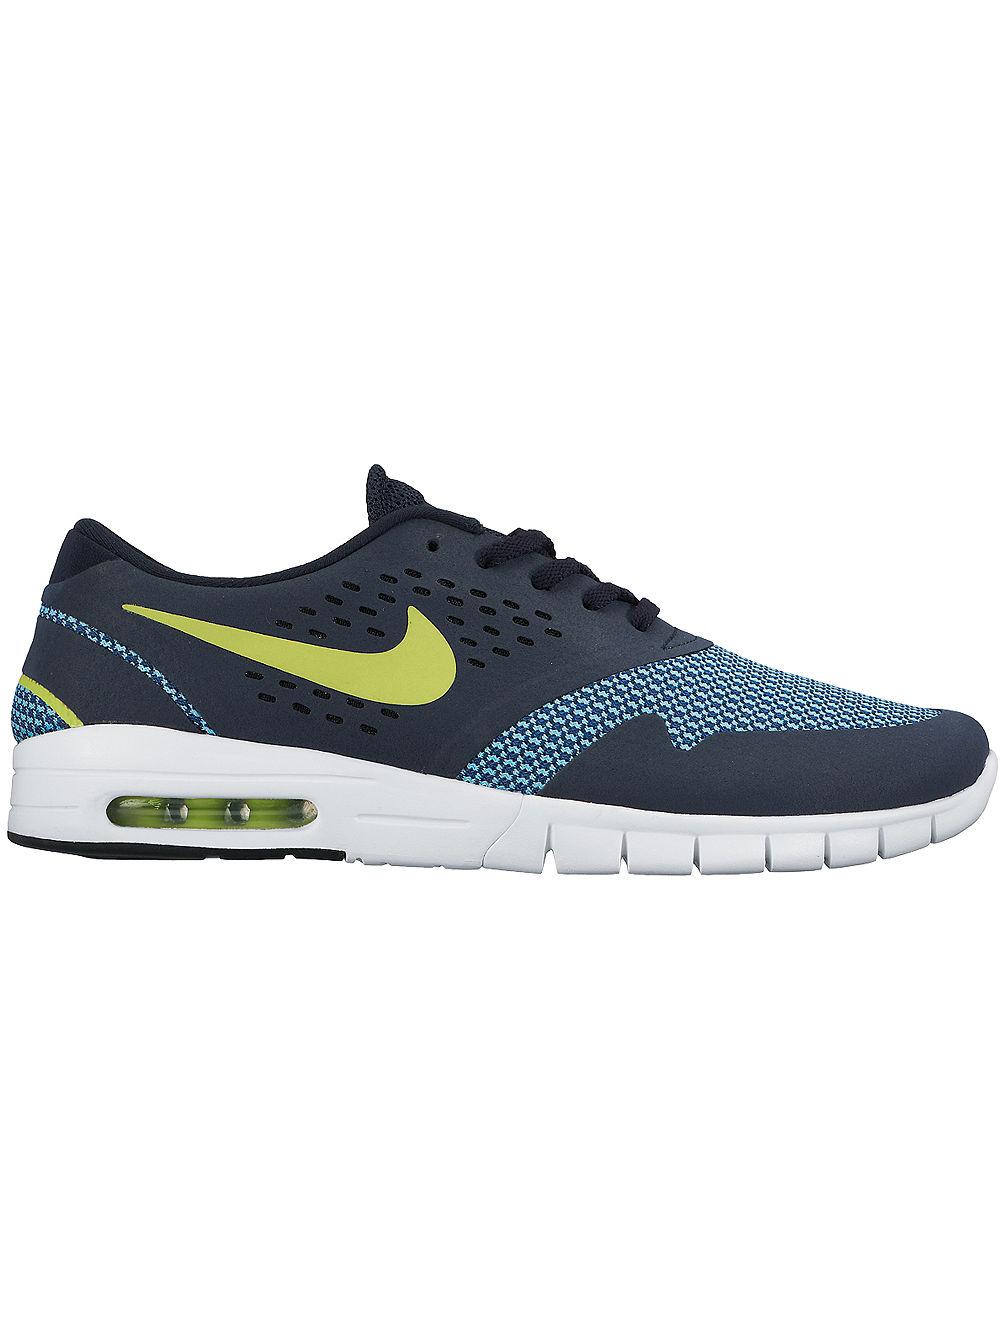 Nike Eric Koston 2 Max Sneakers - nike - blue-tomato.com